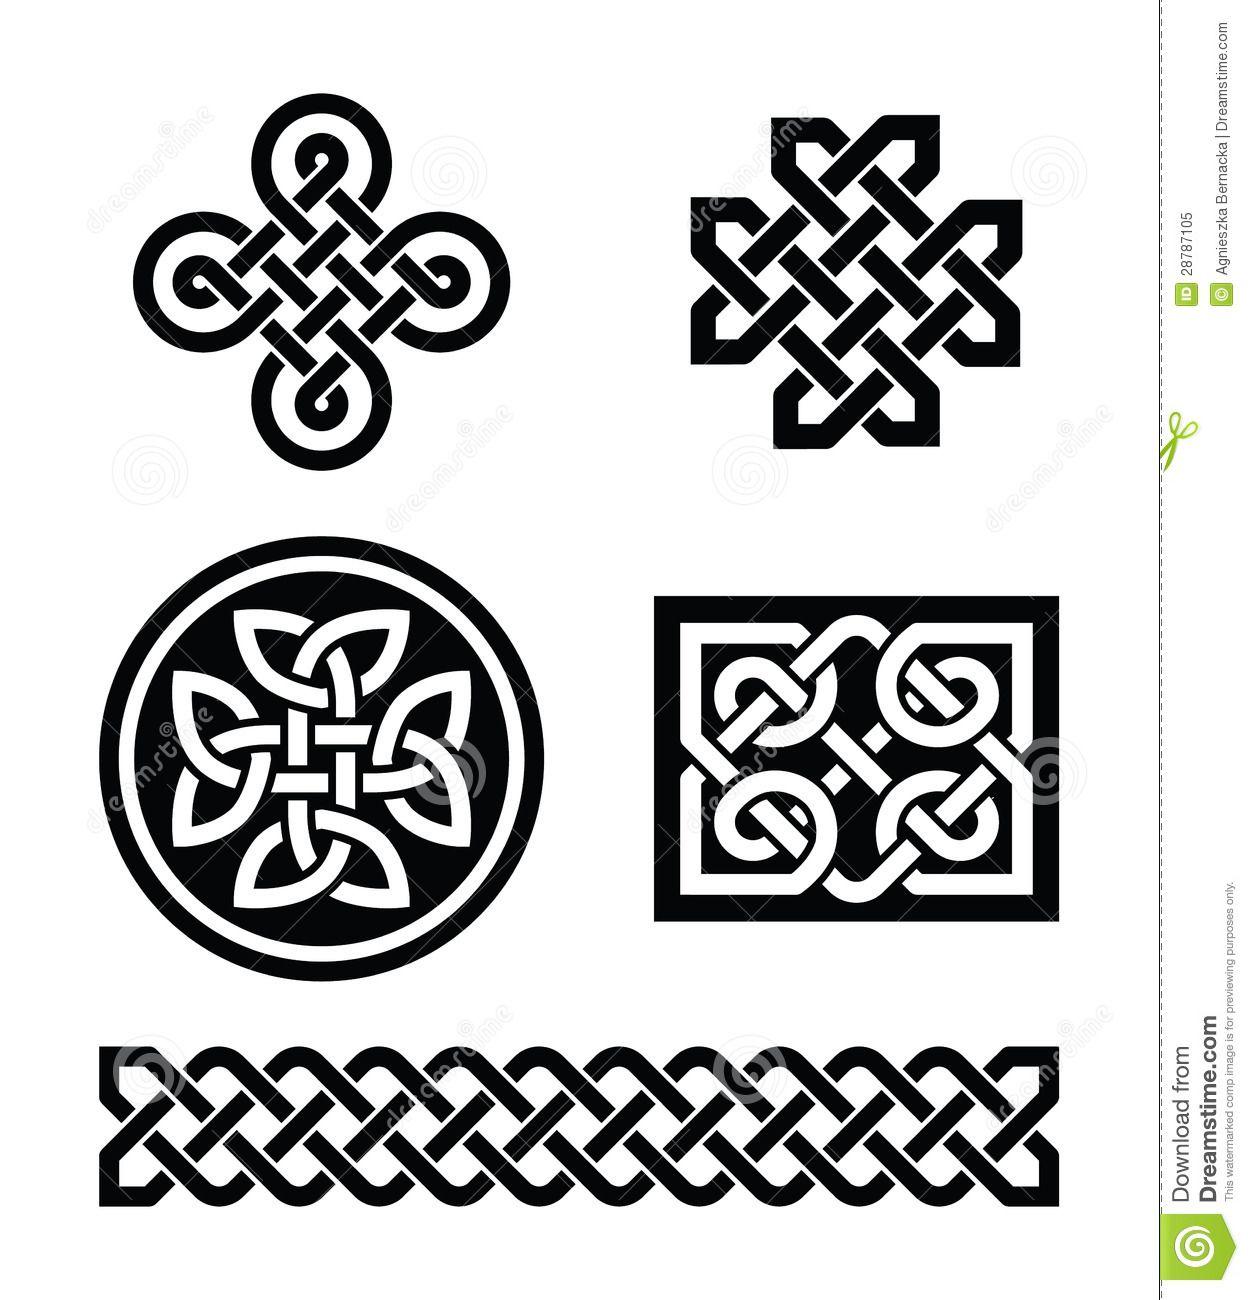 Resultado de imagem para tribal celta   Tribal   Pinterest   Molde